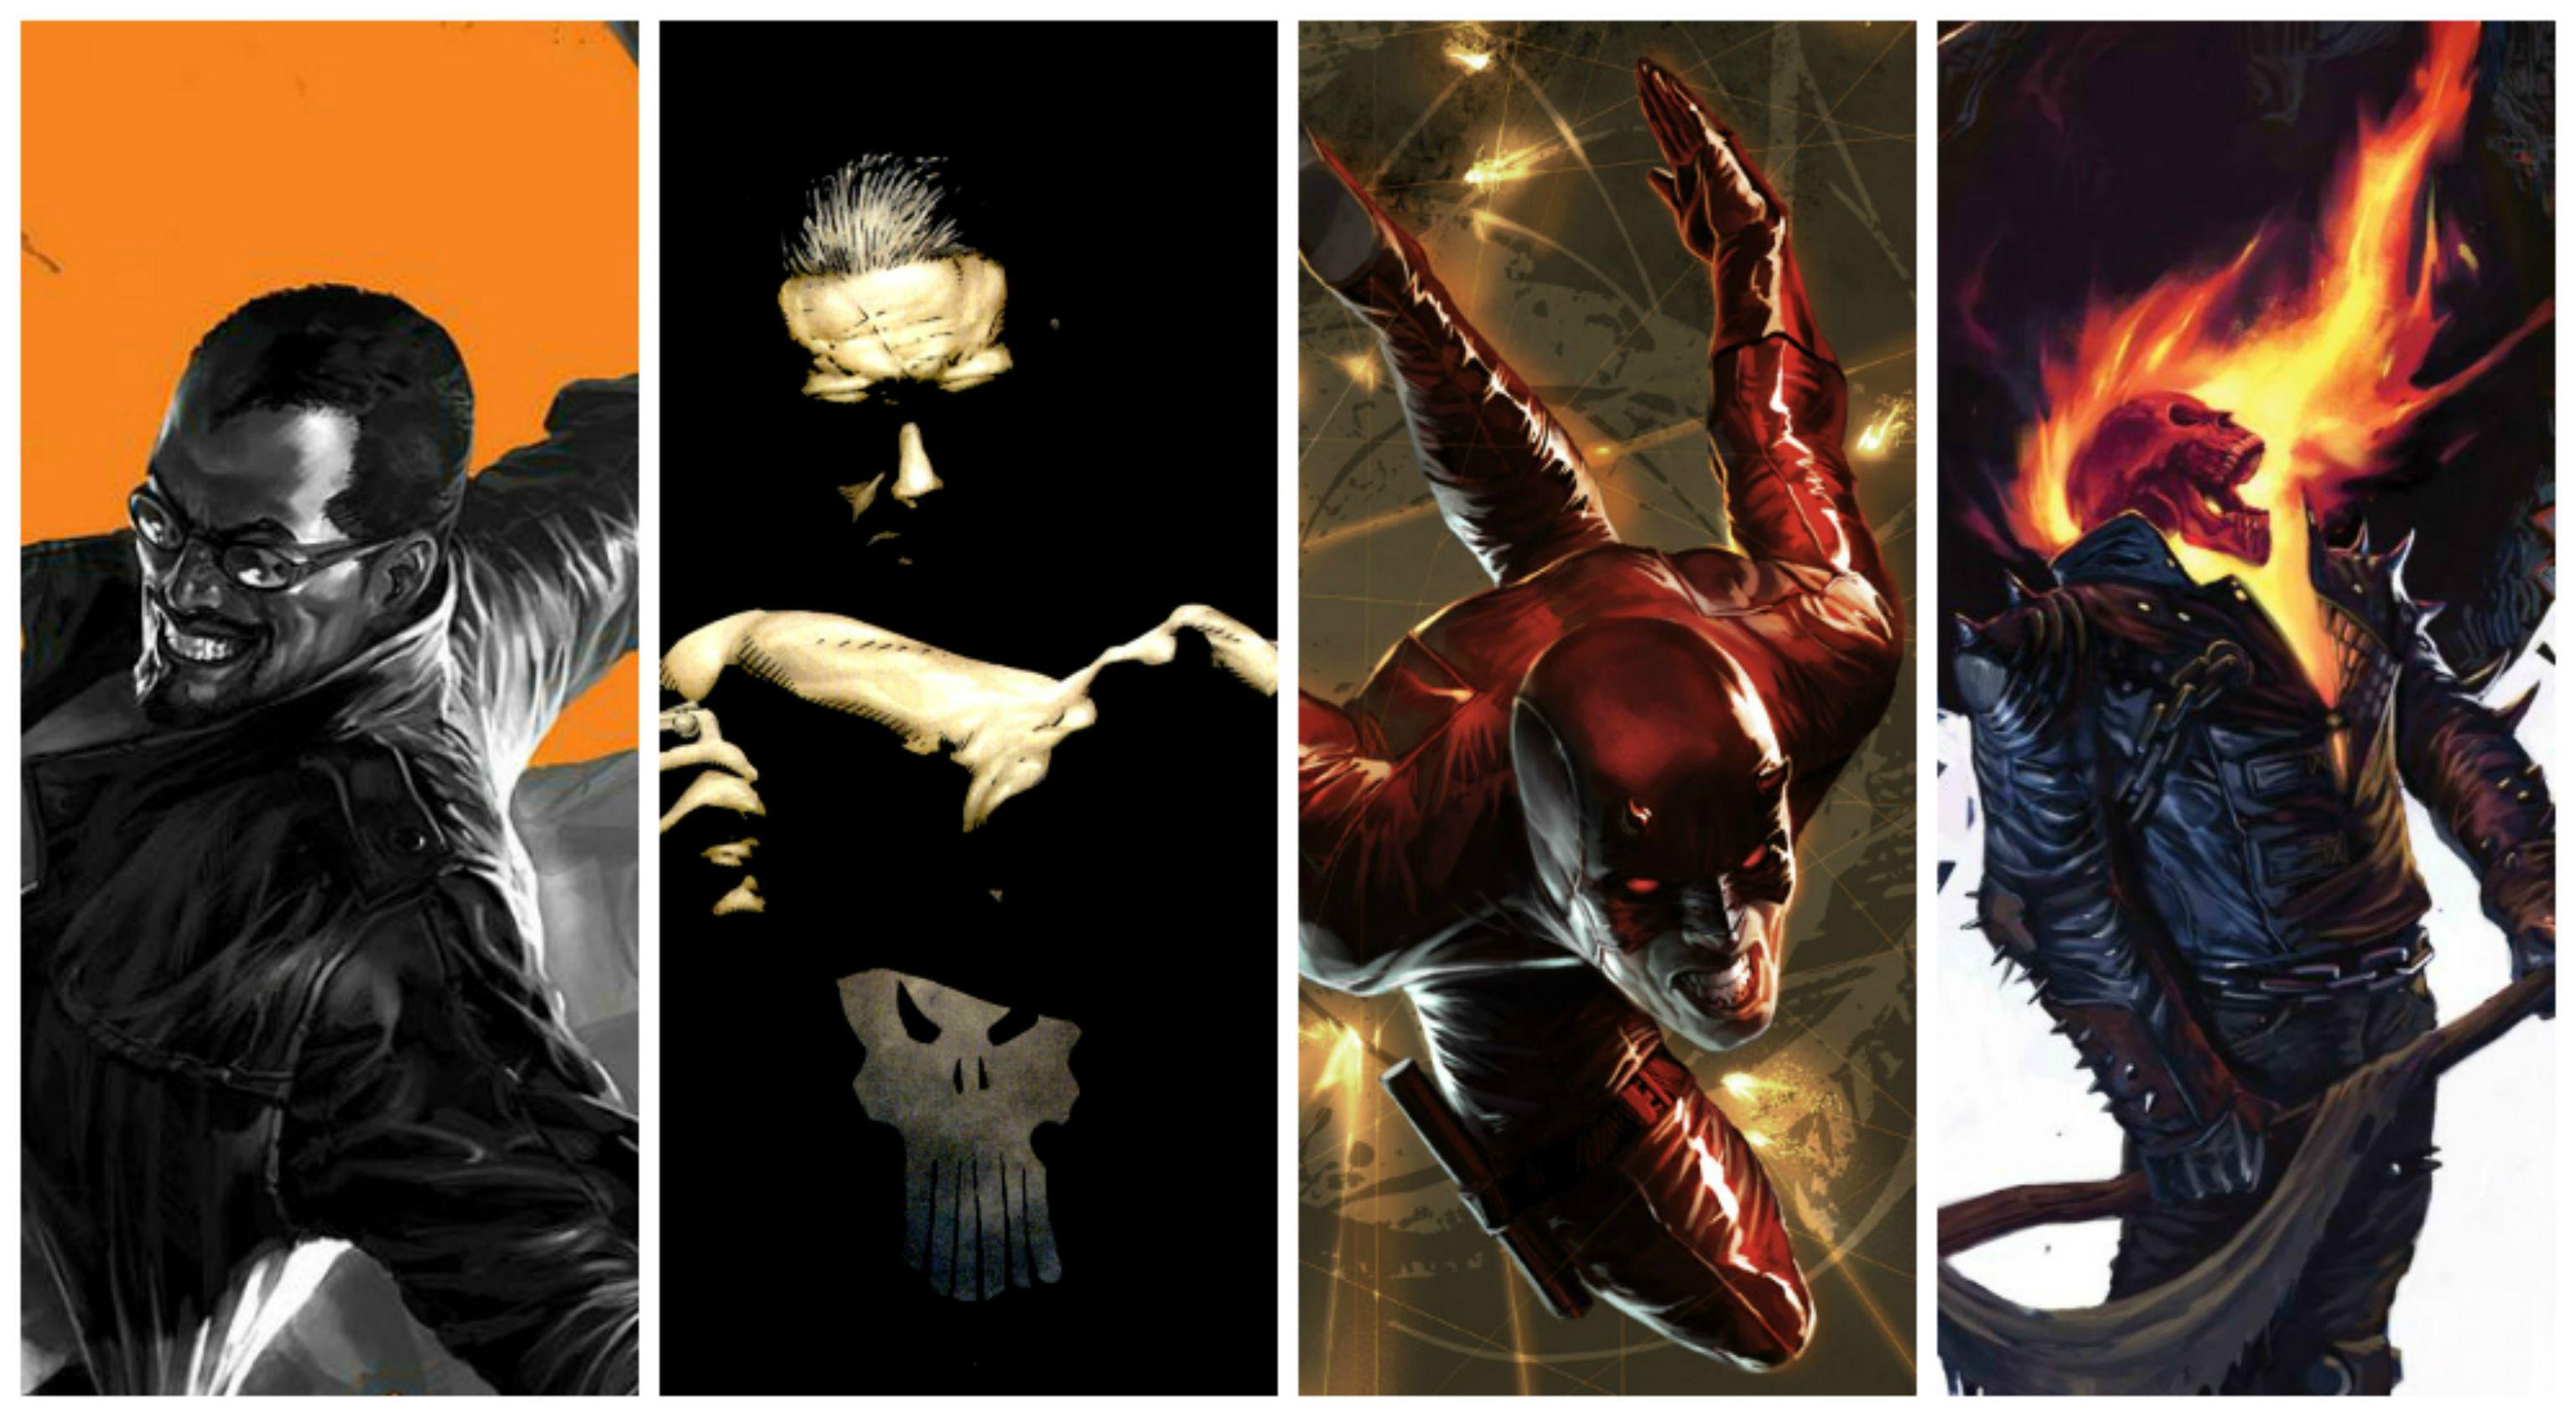 THE PUNISHER Marvel Daredevil Ghost Rider Wallpaper